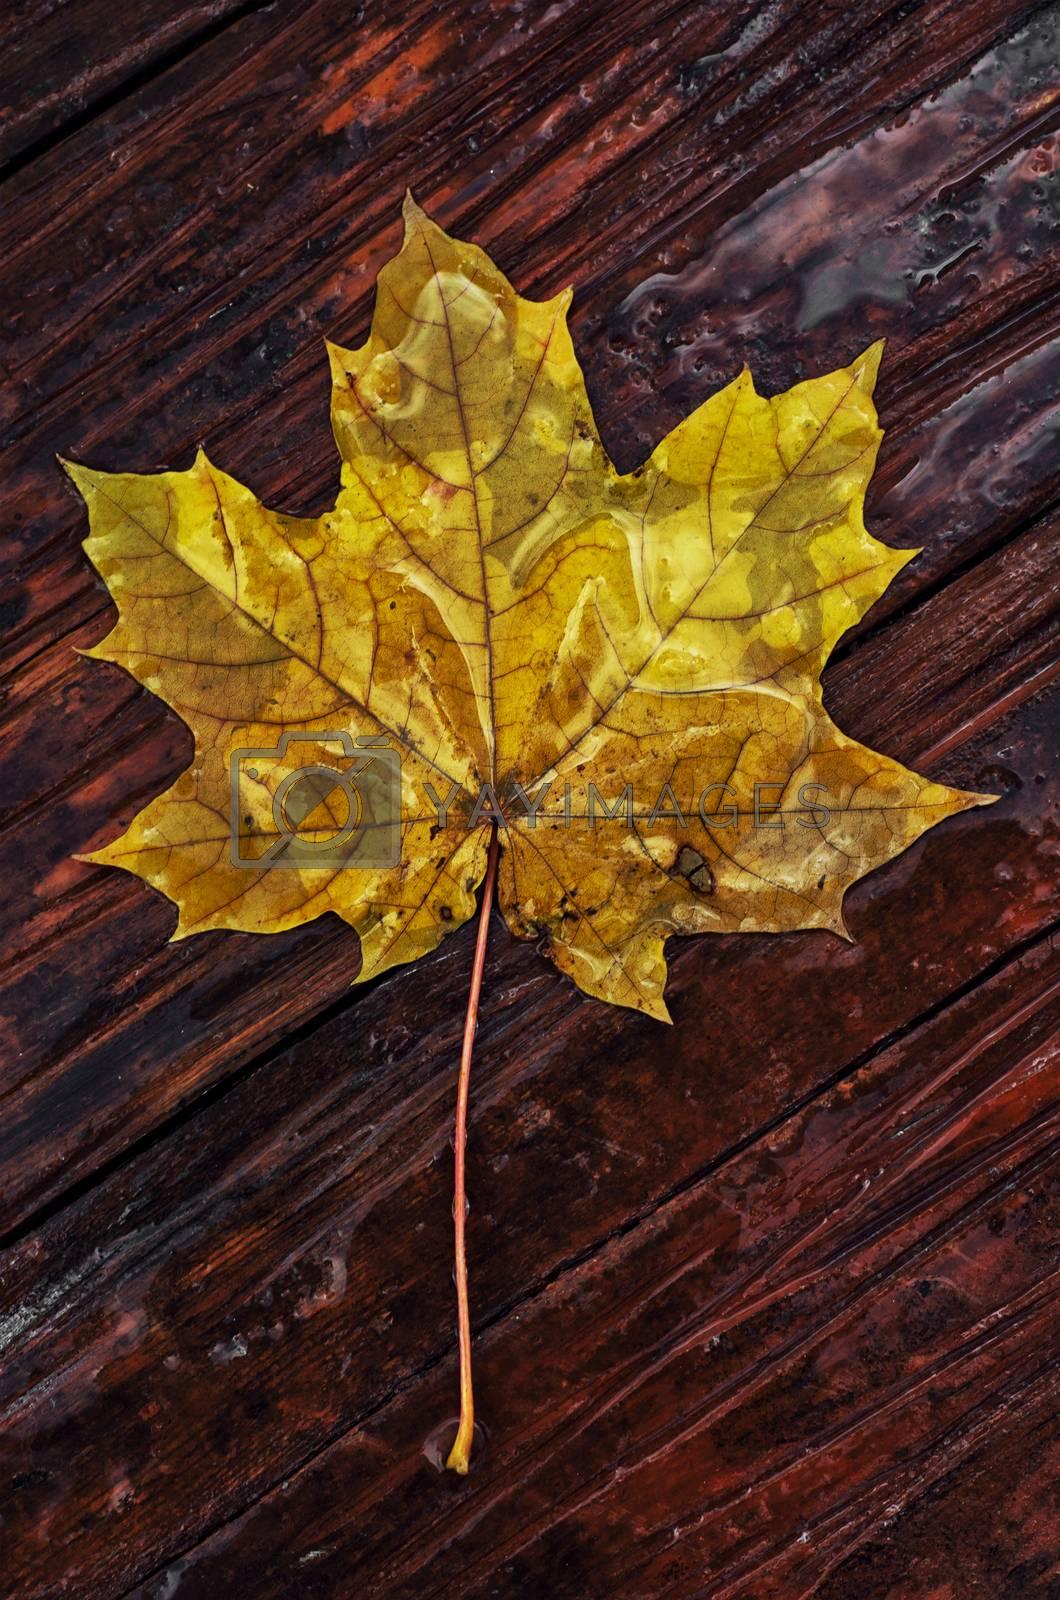 Symbols of autumn, fallen leaves, November